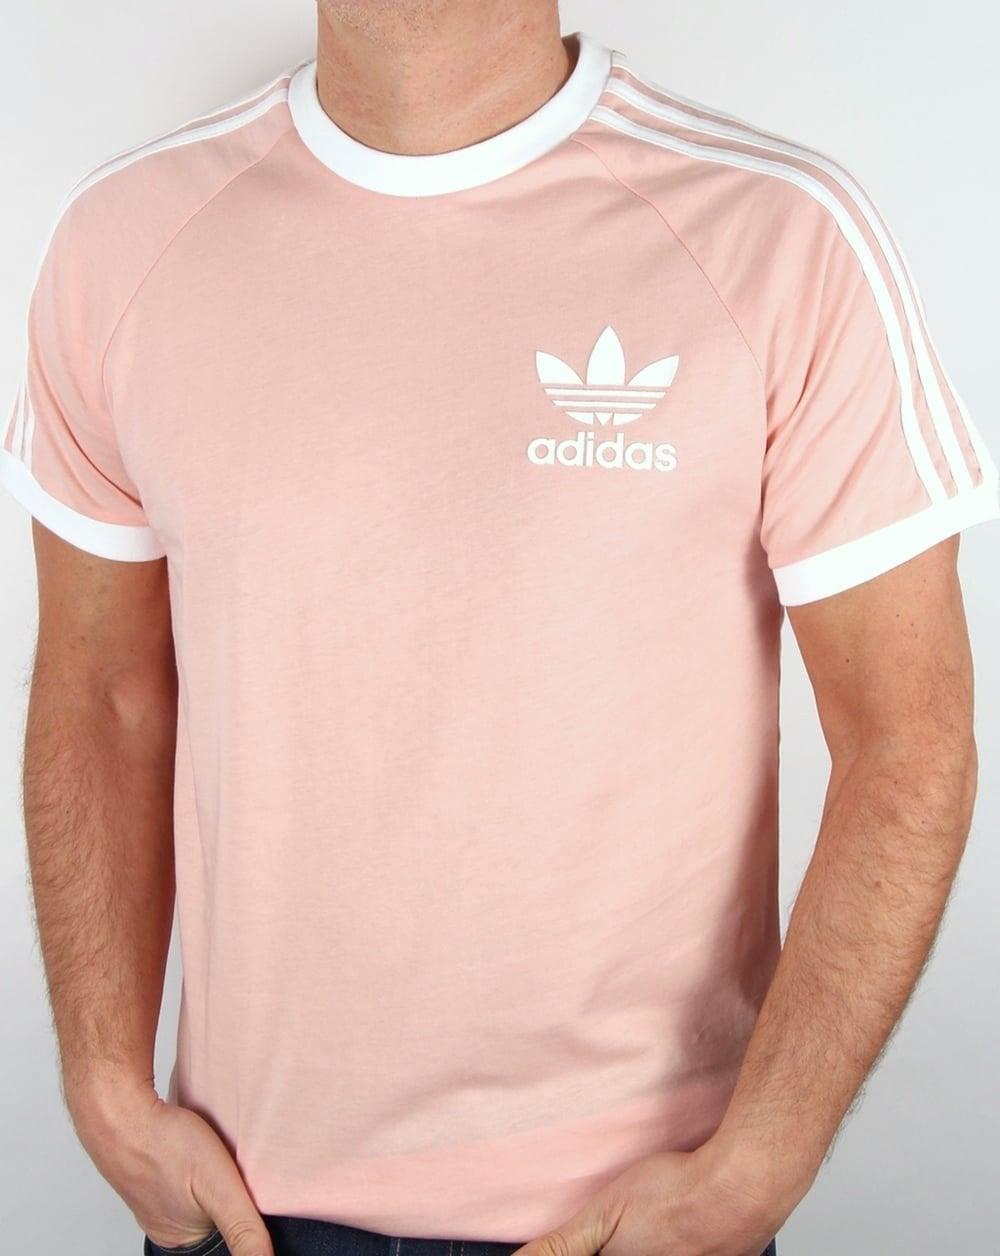 adidas Originals T Shirt 3 Stripes Vapour Pink